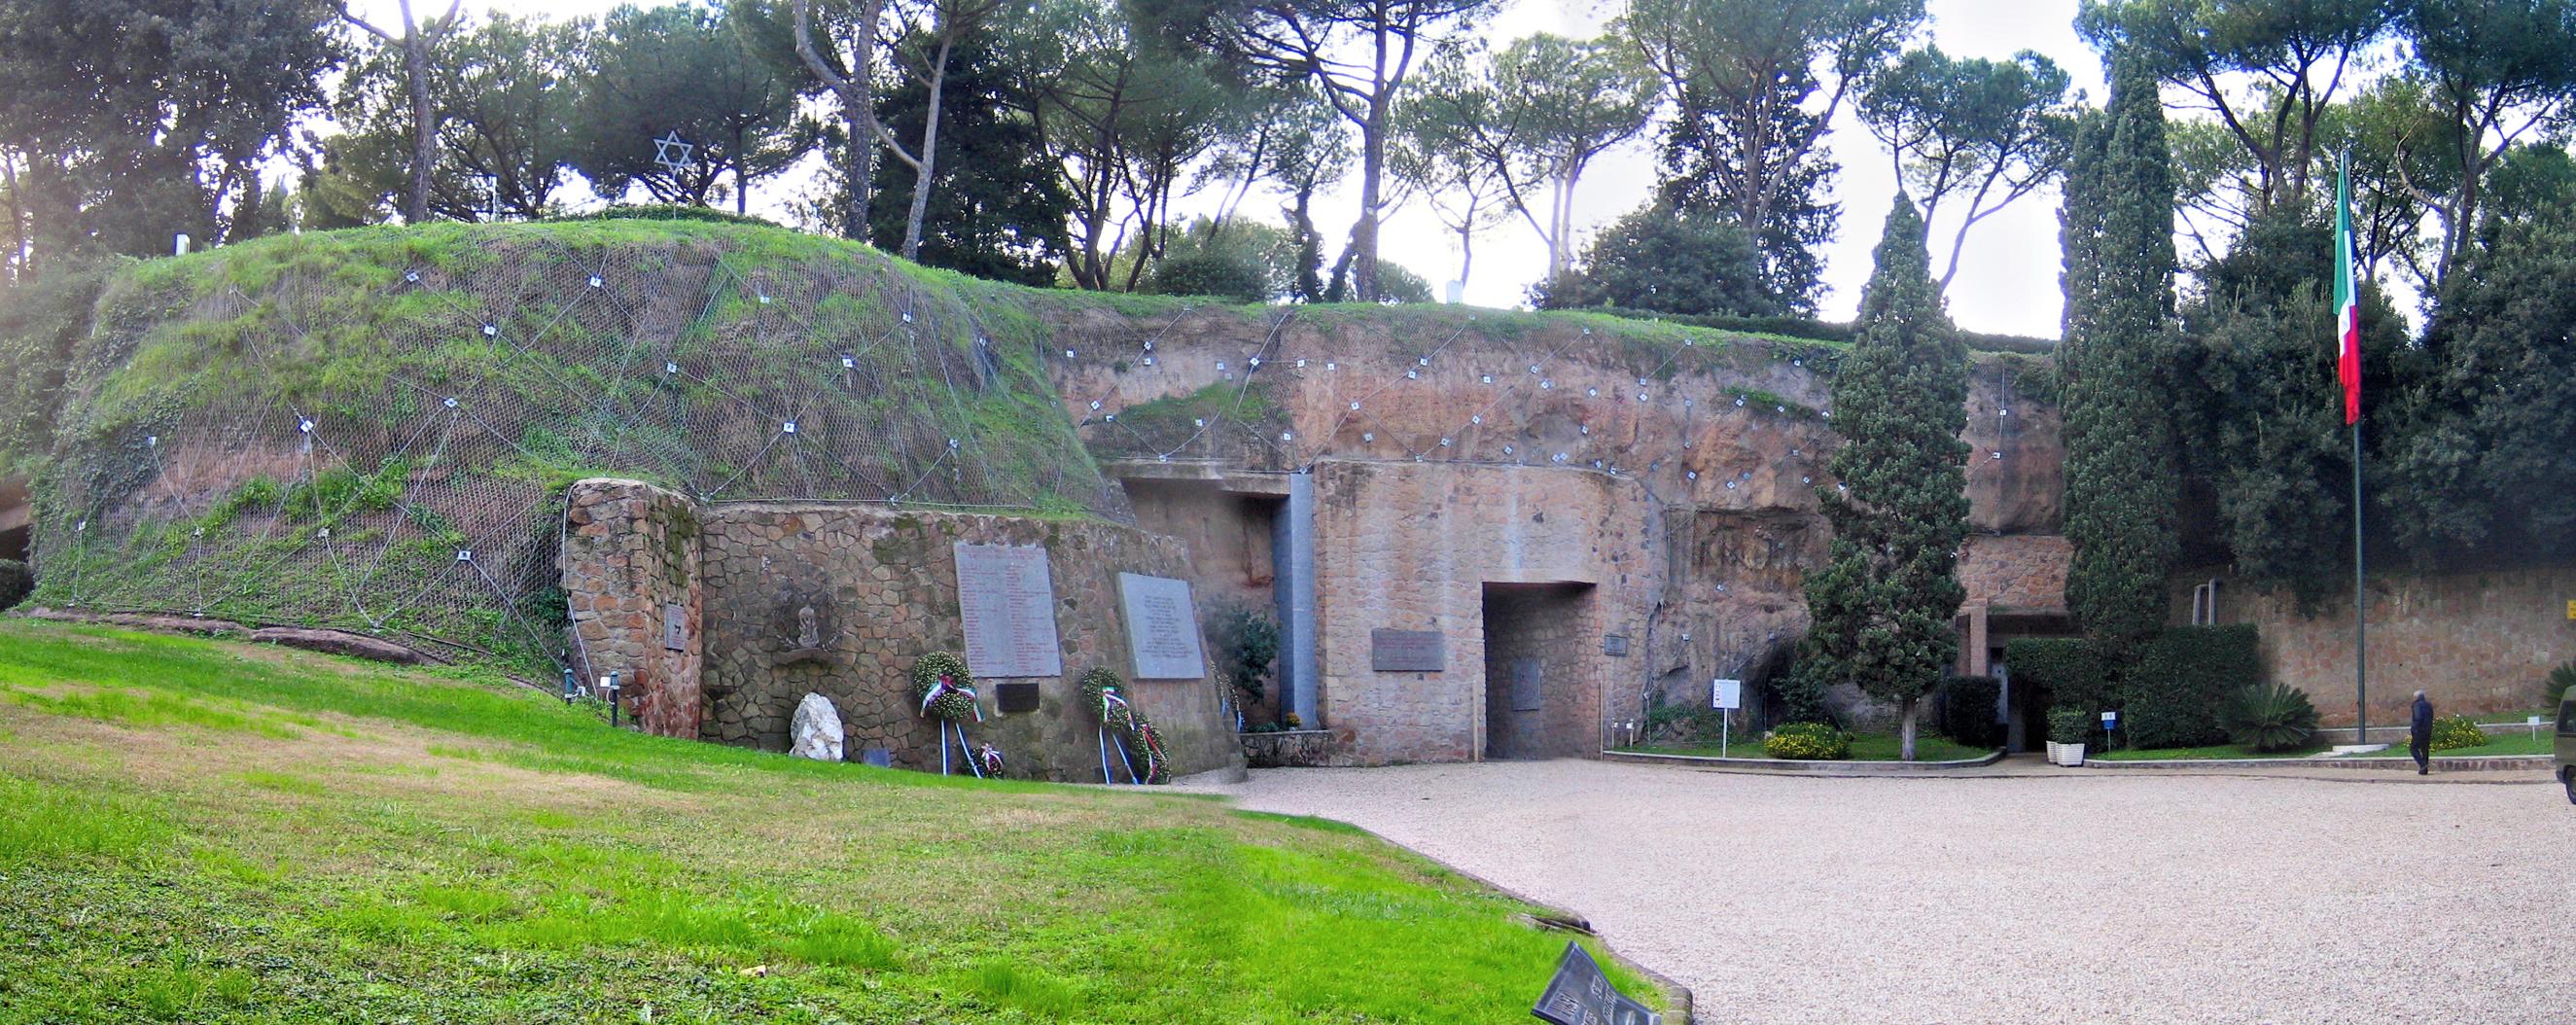 Roma-fosseardeatine6.jpg